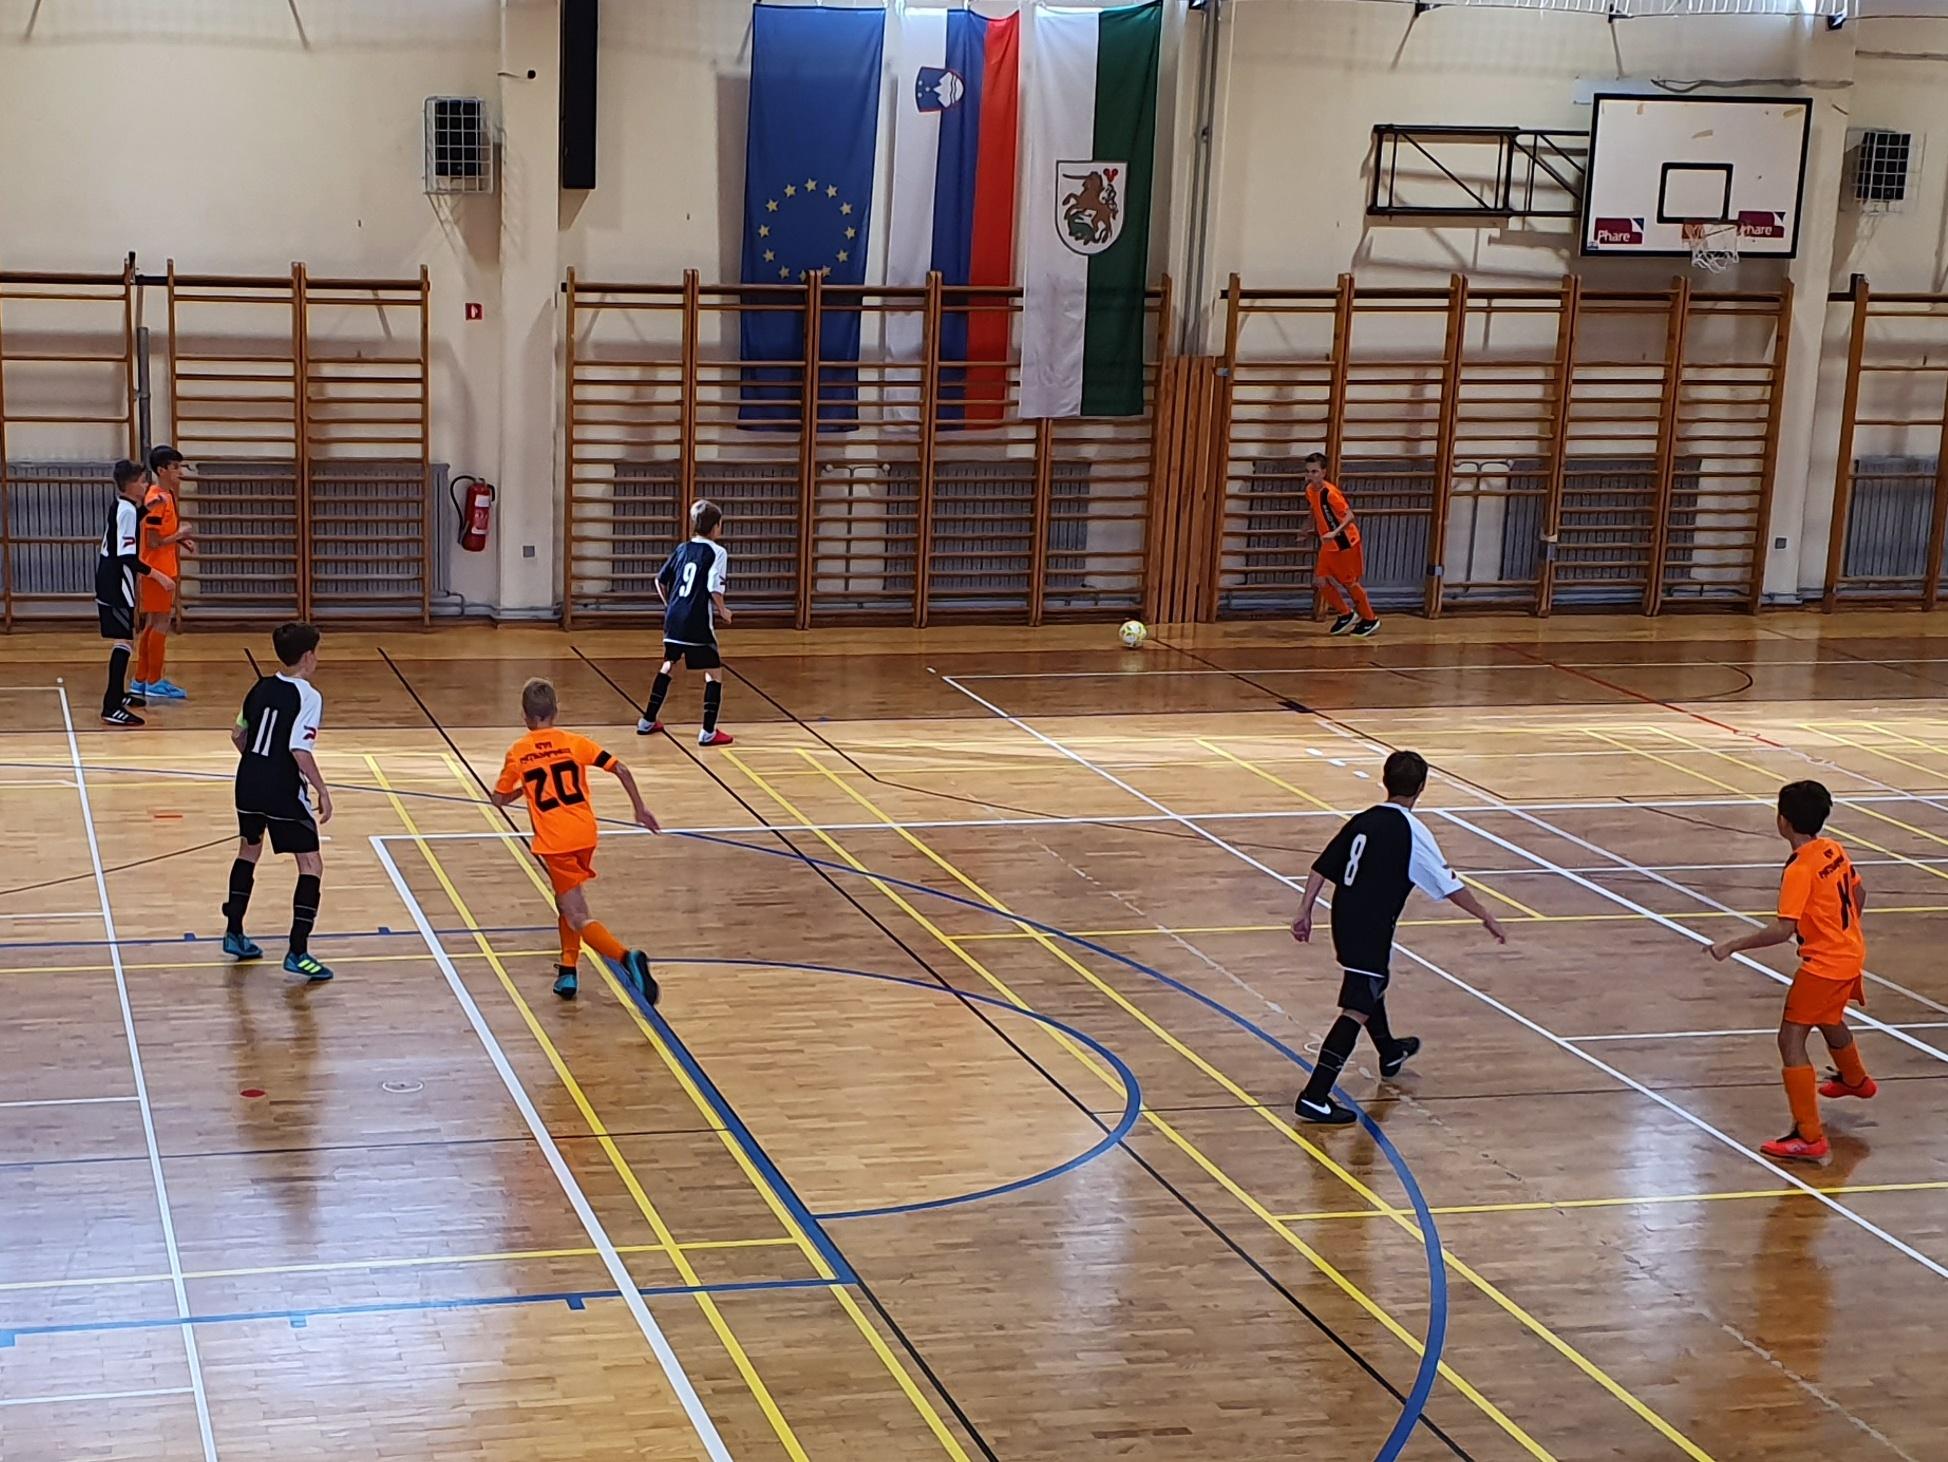 U13: Poraz proti Dobovcu